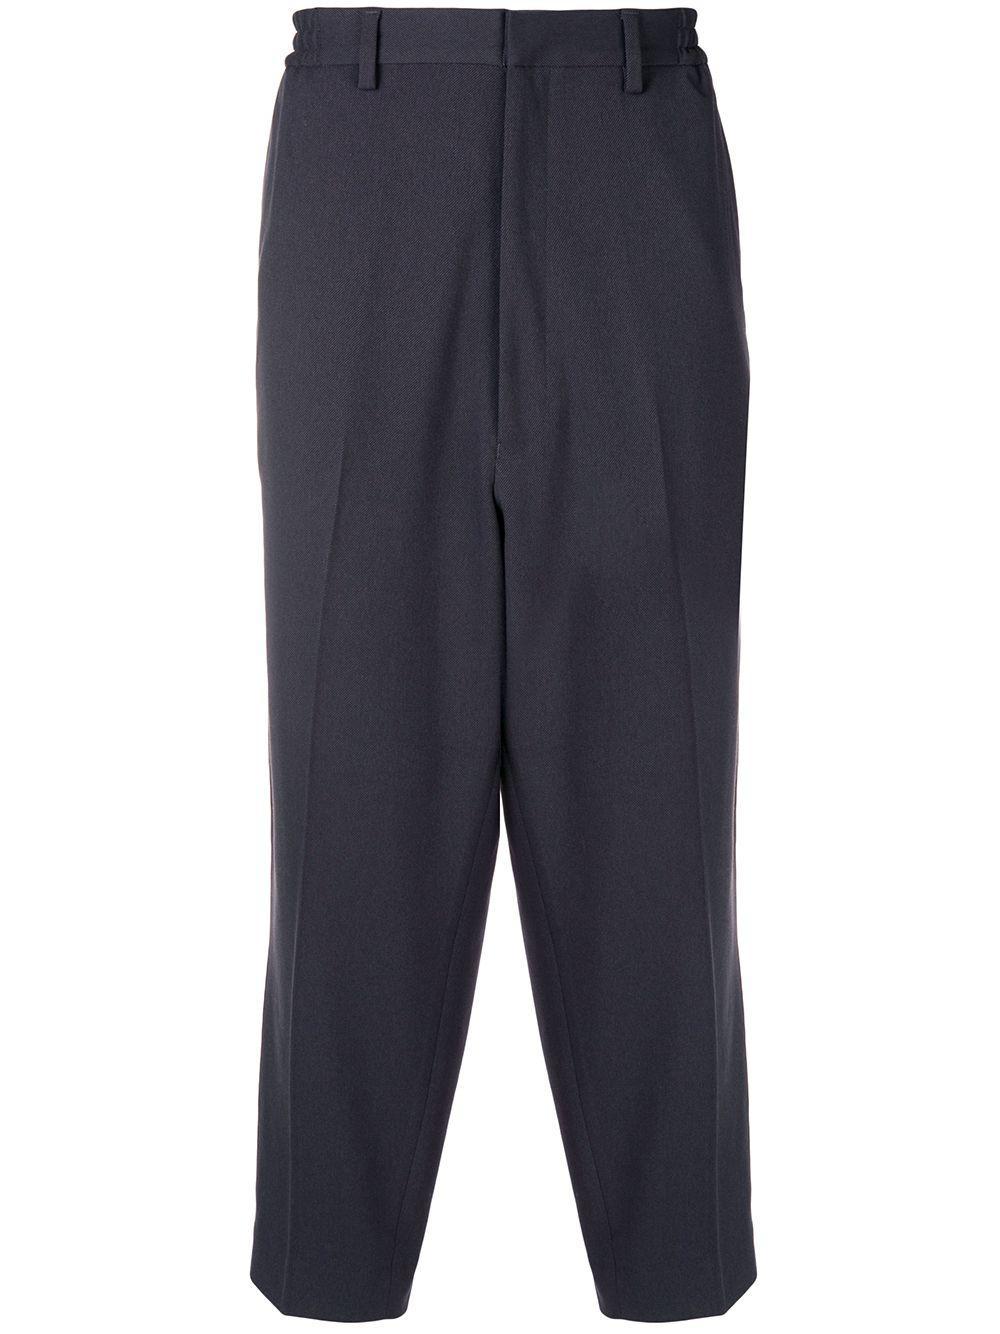 N.hoolywood N. Hoolywood Cropped Wide-leg Trousers - Grey